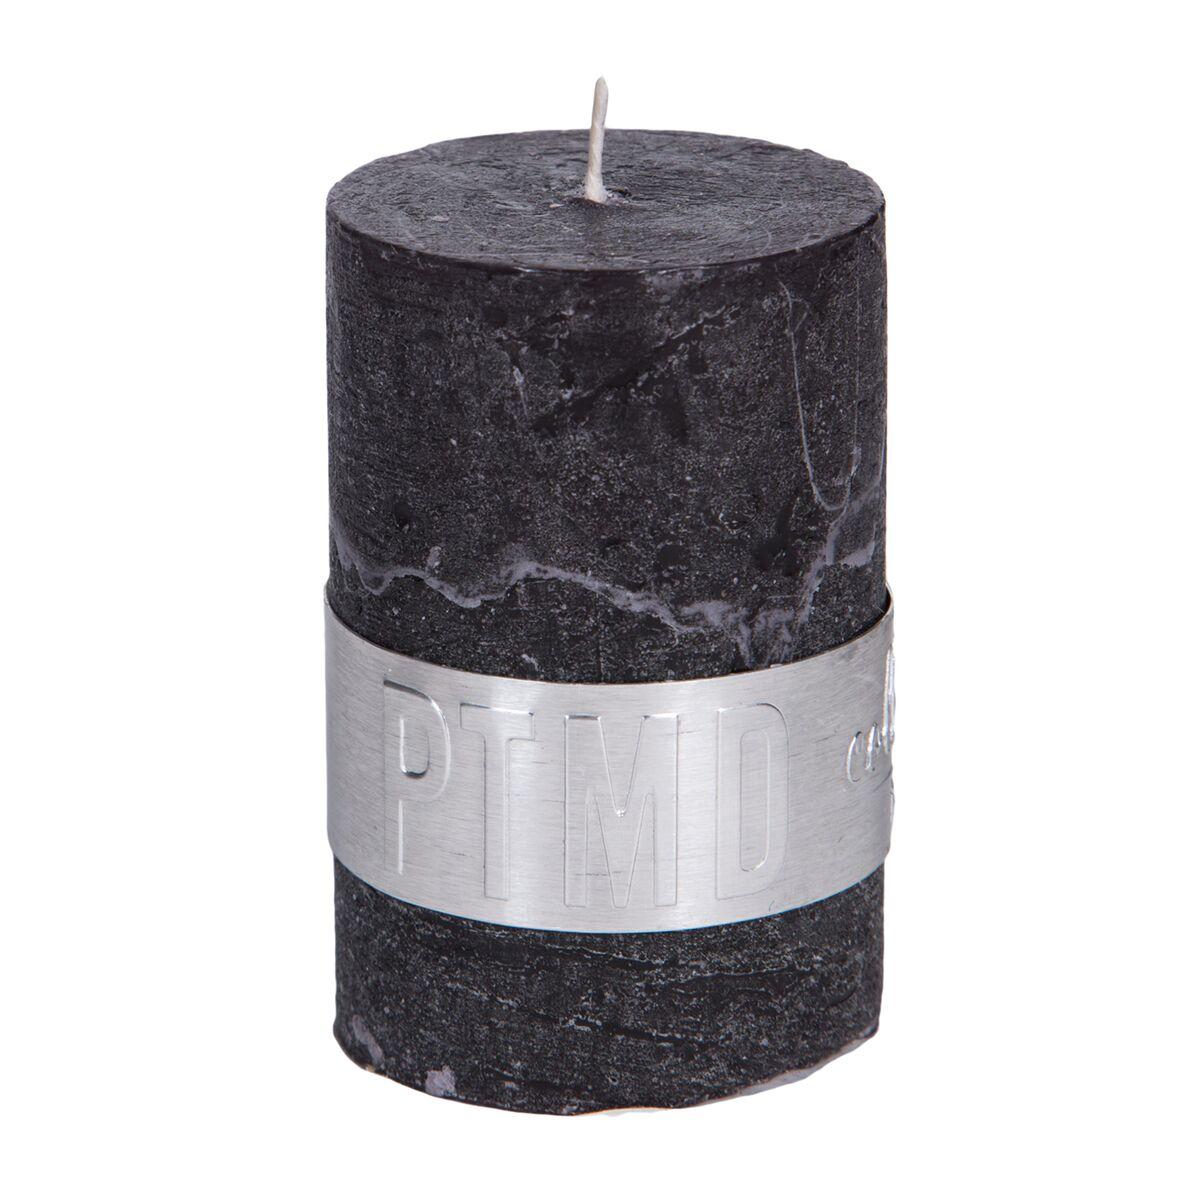 PTMD Kaars charcoal black 6x4cm